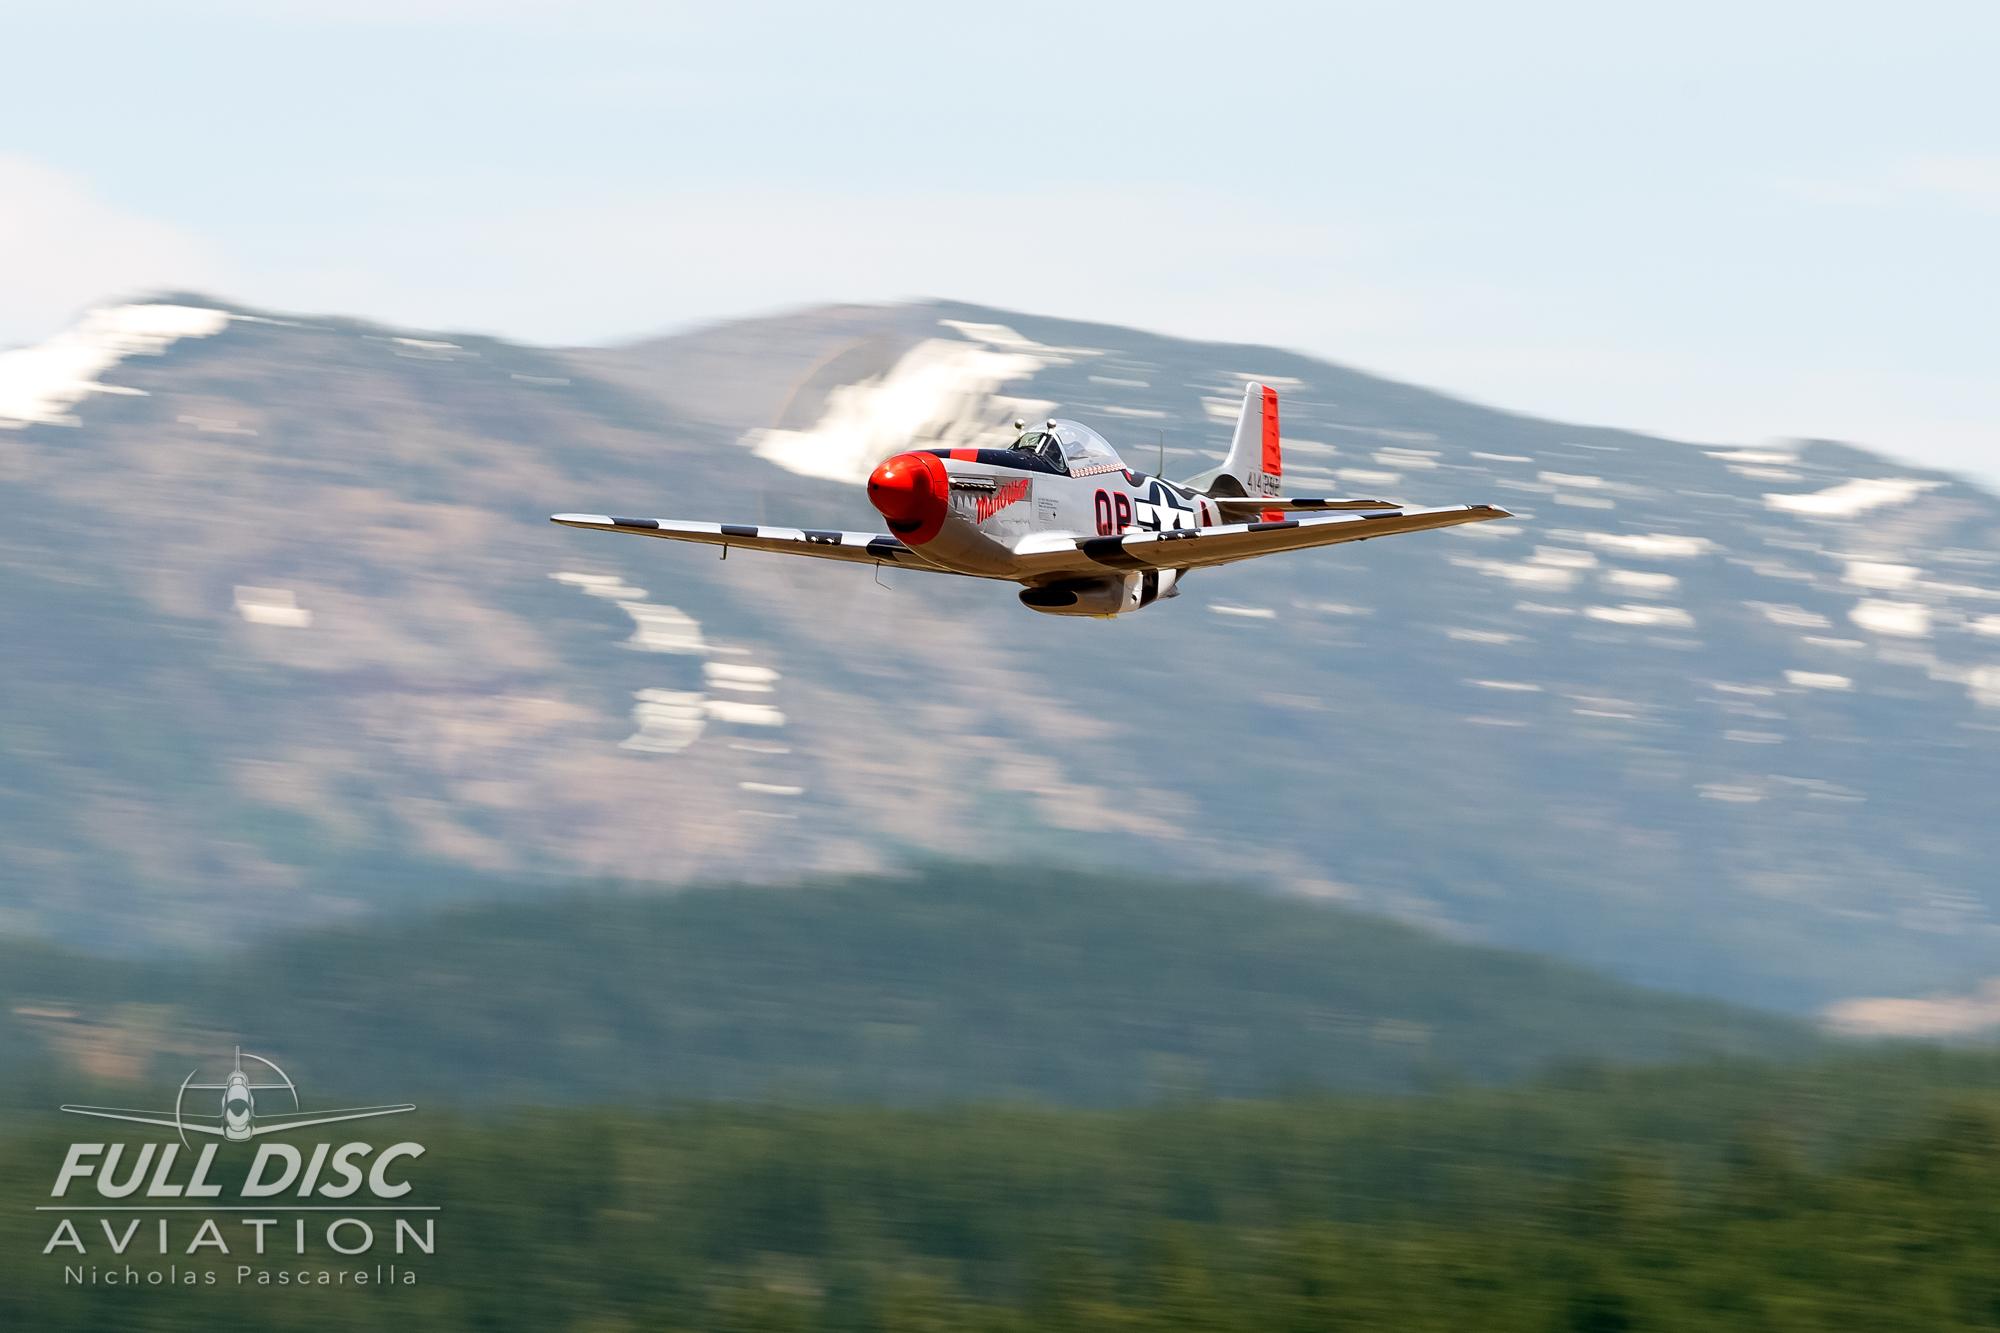 nickpascarella_nicholaspascarella_fulldiscaviation_aircraft_mustang_mountains_p51.jpg